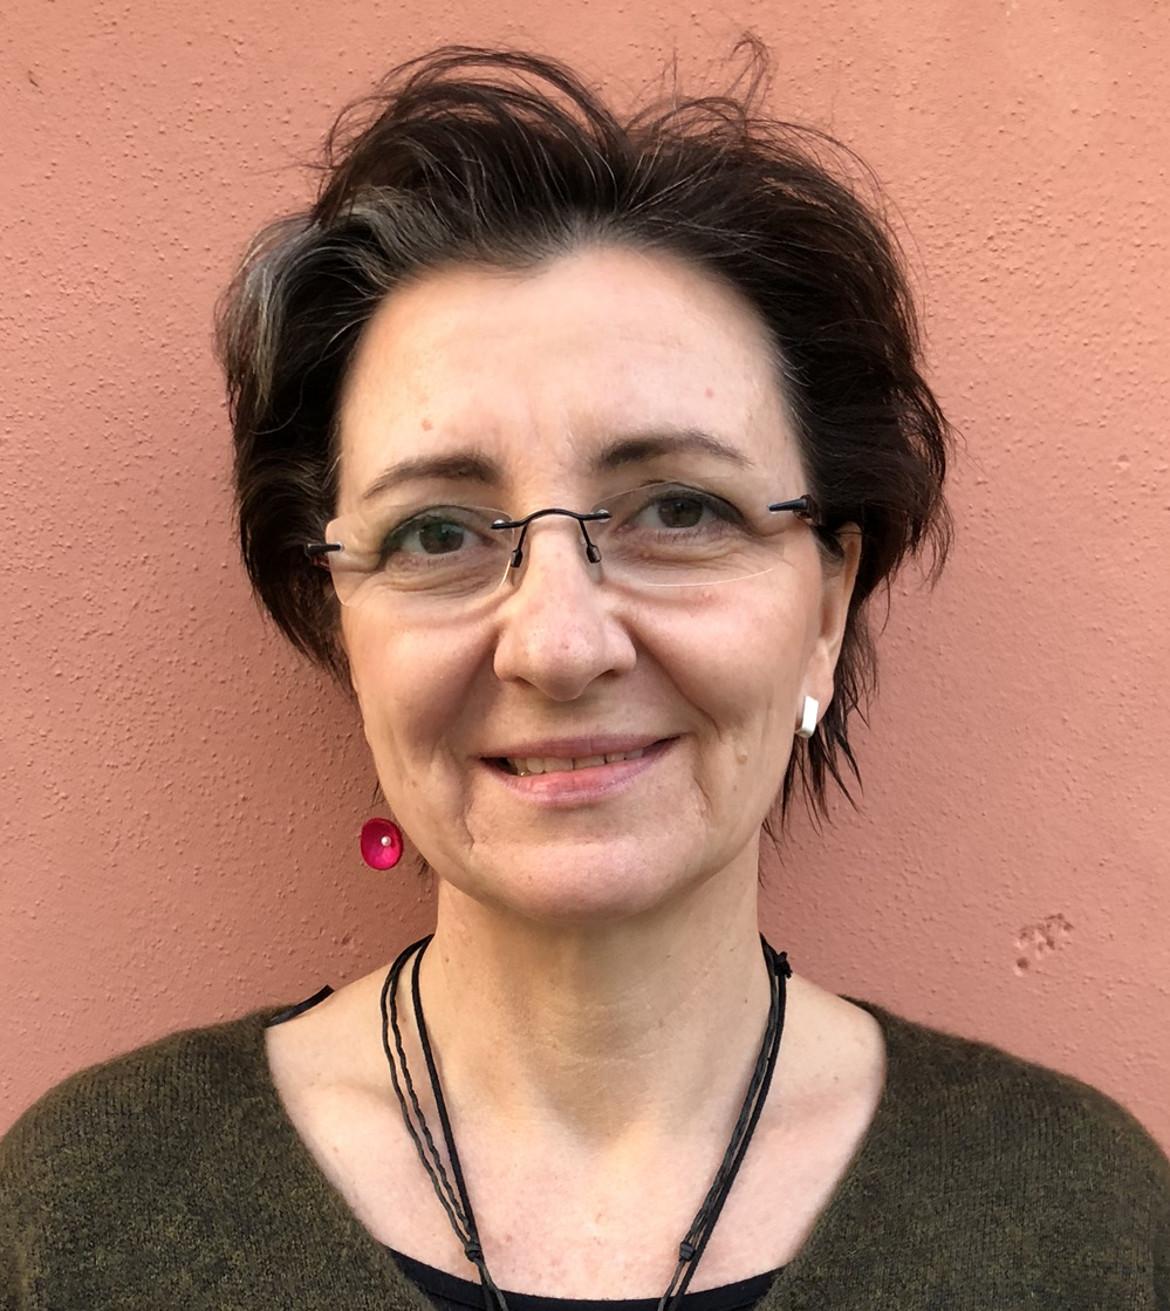 Birgit Papendieck